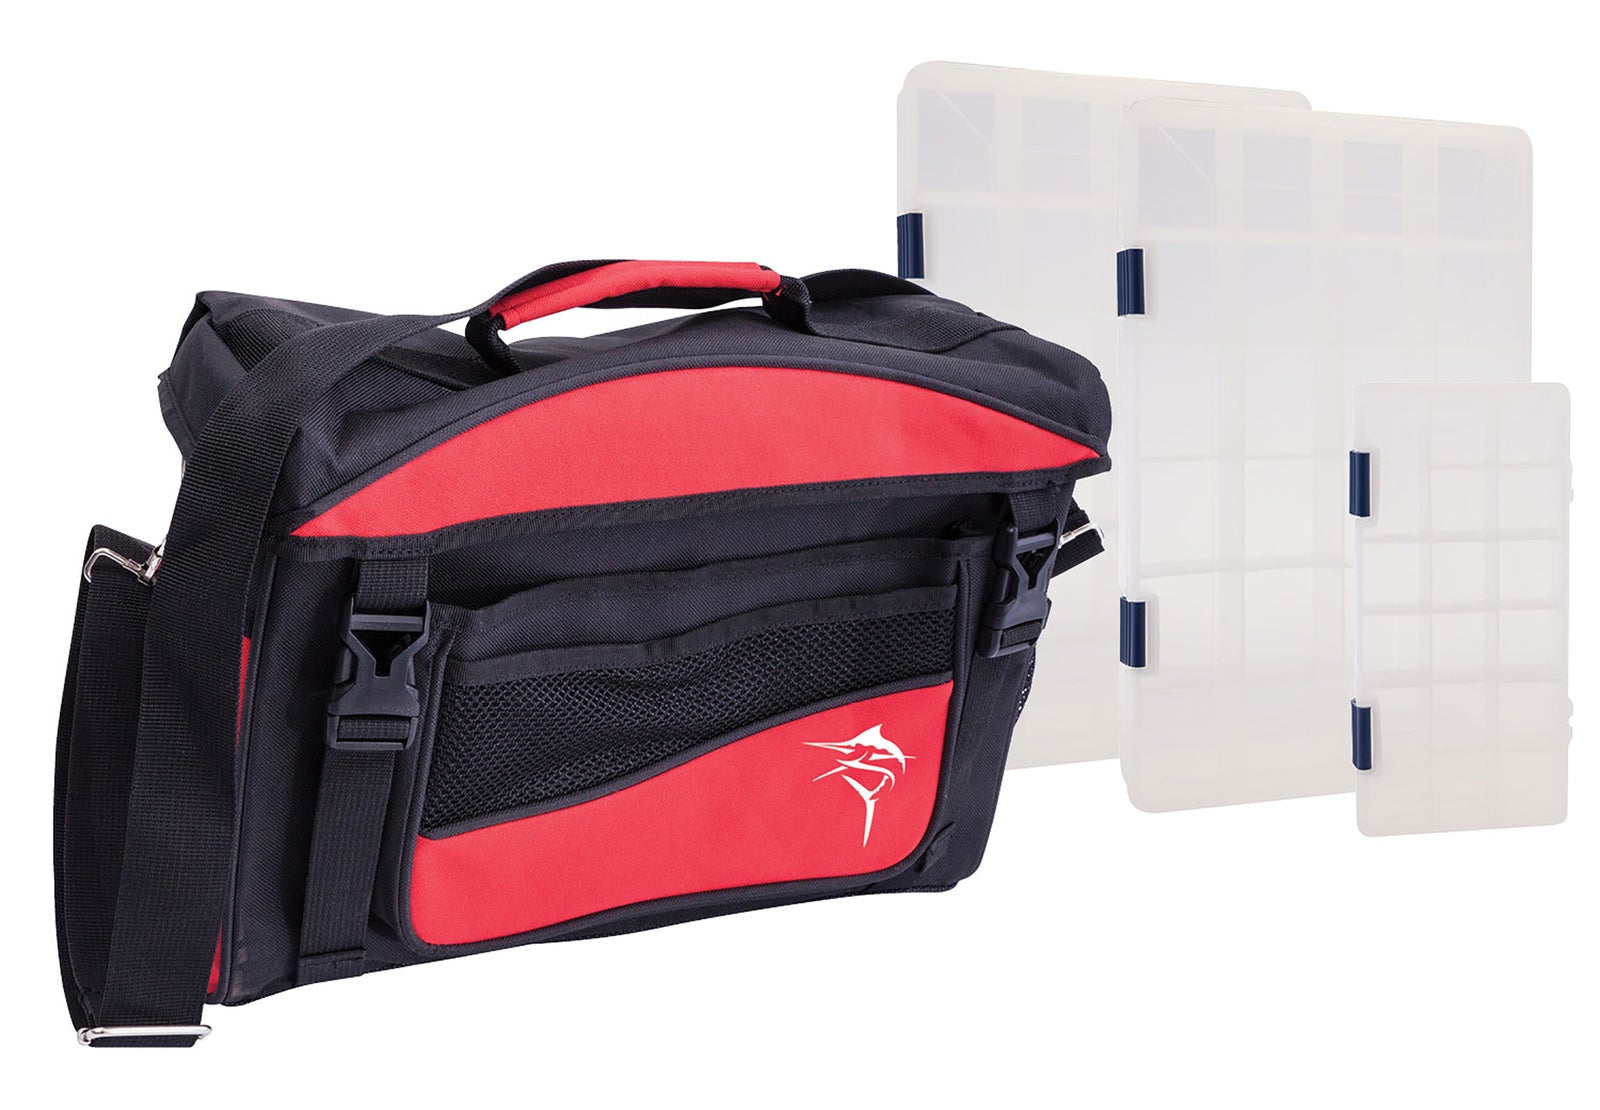 Jarvis Walker 87027 Lure Bag 3 Box - Black & Red Red